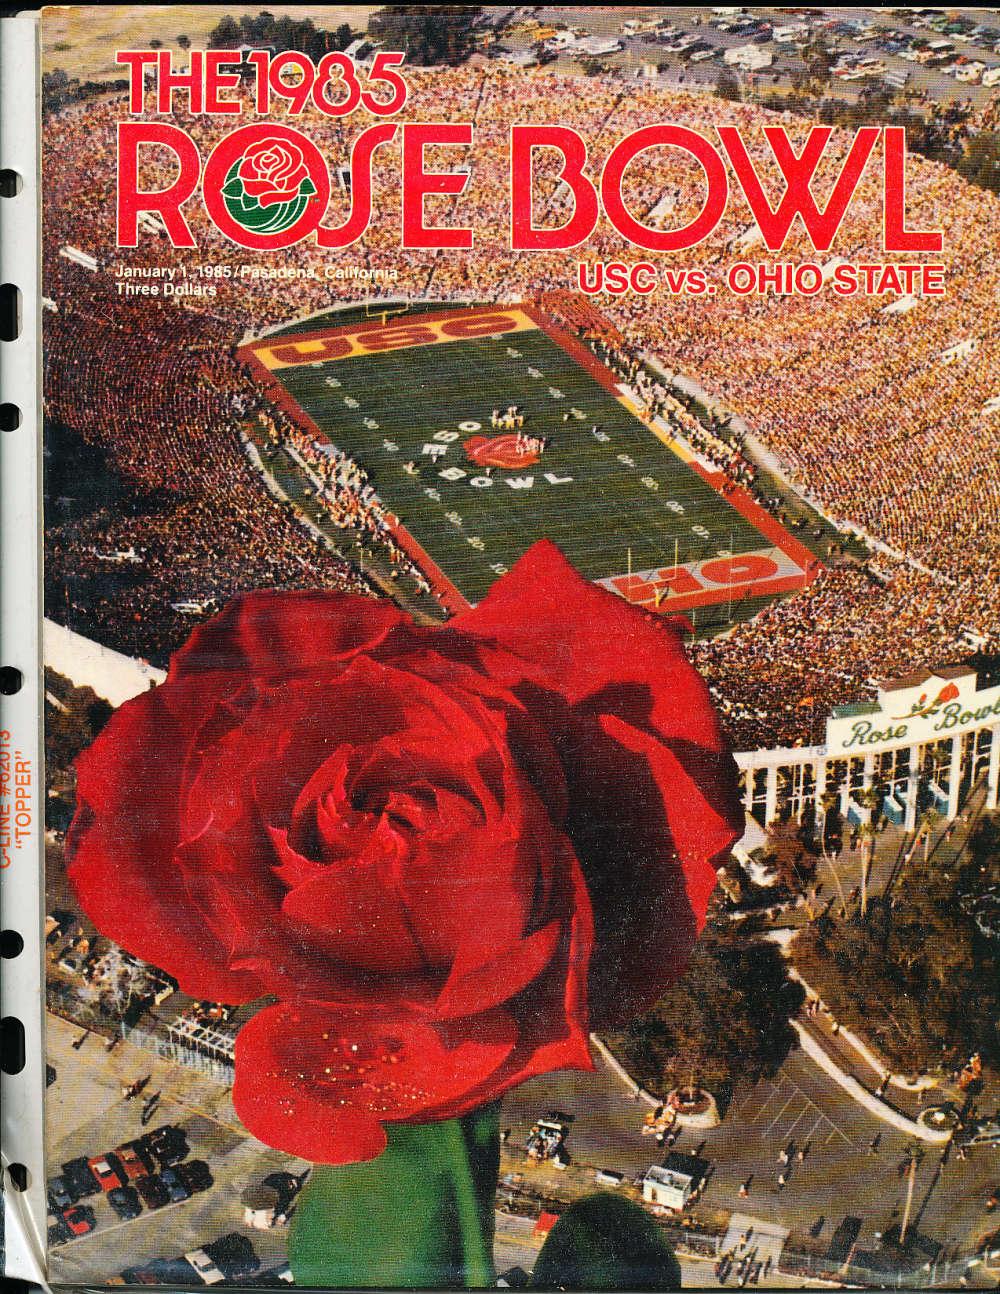 1985 Rose Bowl Program Usc vs Ohio State